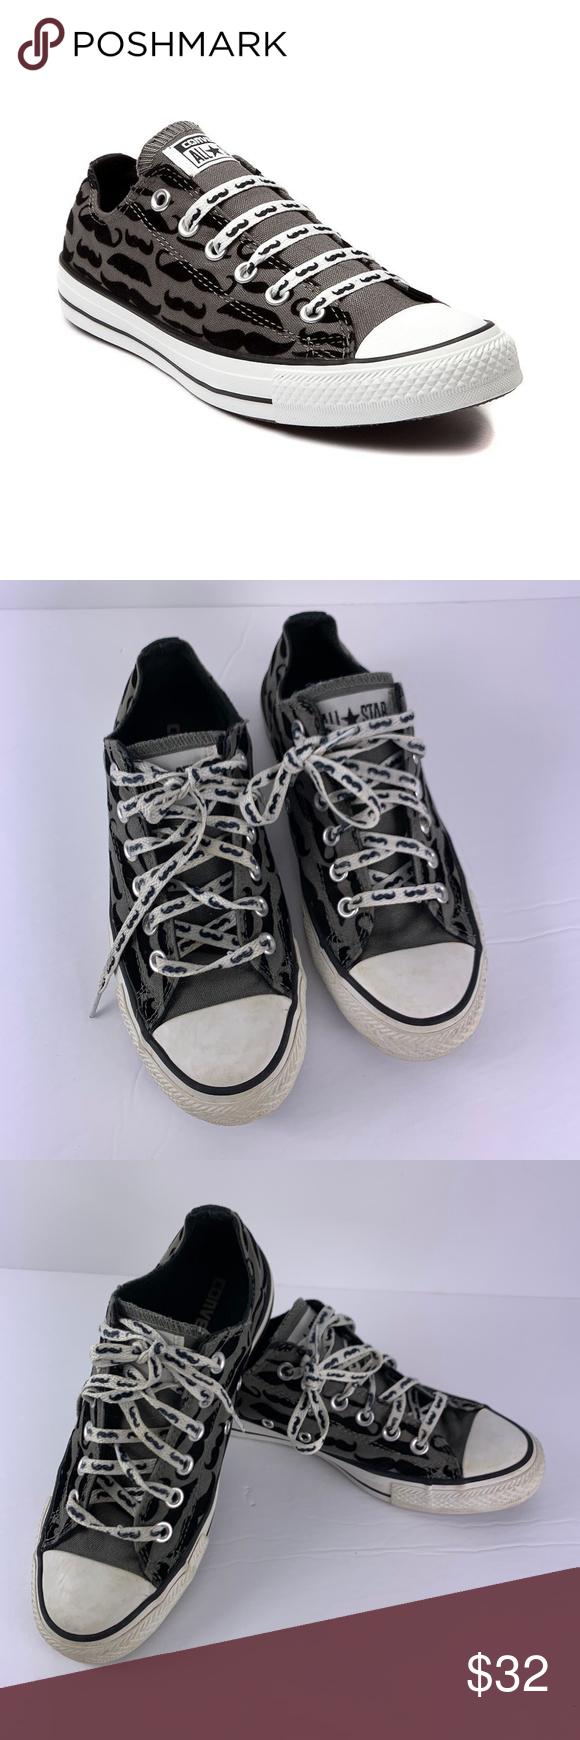 8a79b608ad32 Converse Mustache Print Shoes Sz 7 Womens Sz 5 Men Converse Mustache Print  Shoes Sz 7